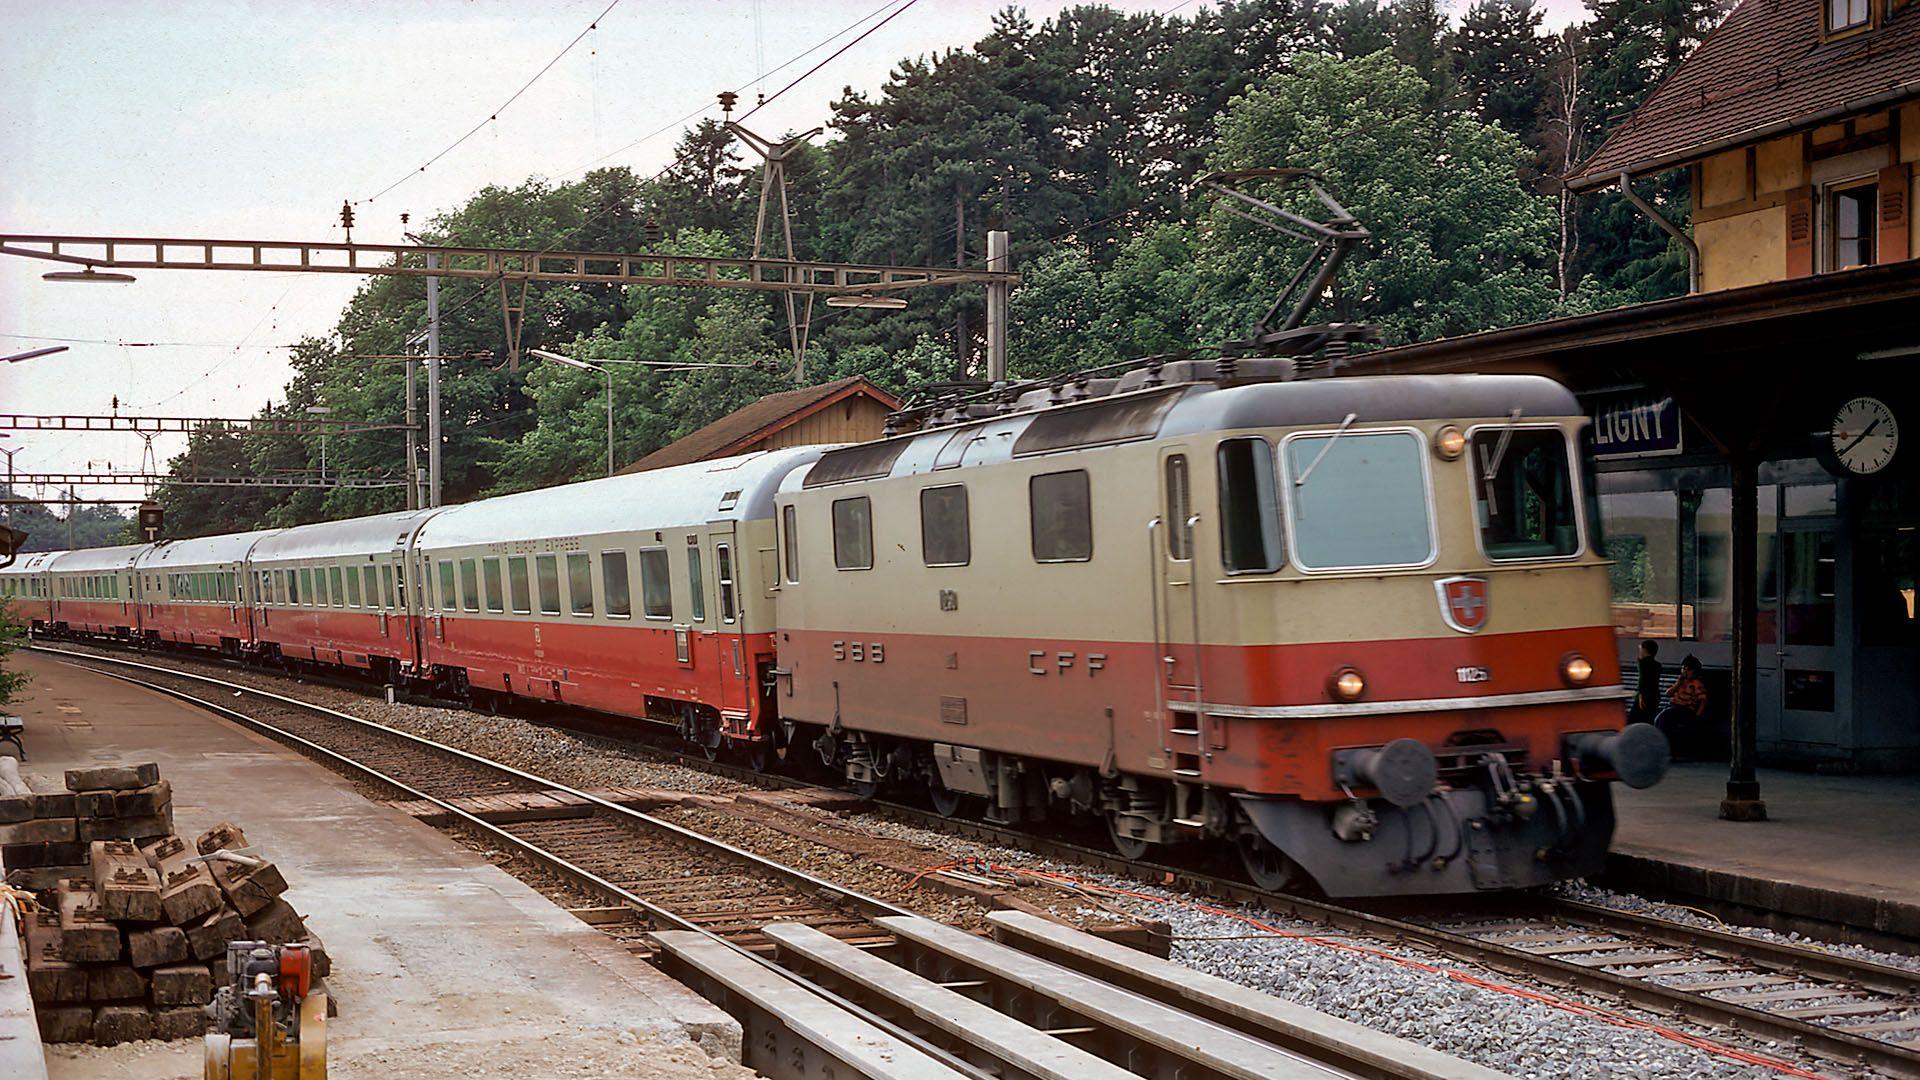 TEE Lemano Céligny 1976 Re4/4 II 11251 in 2019